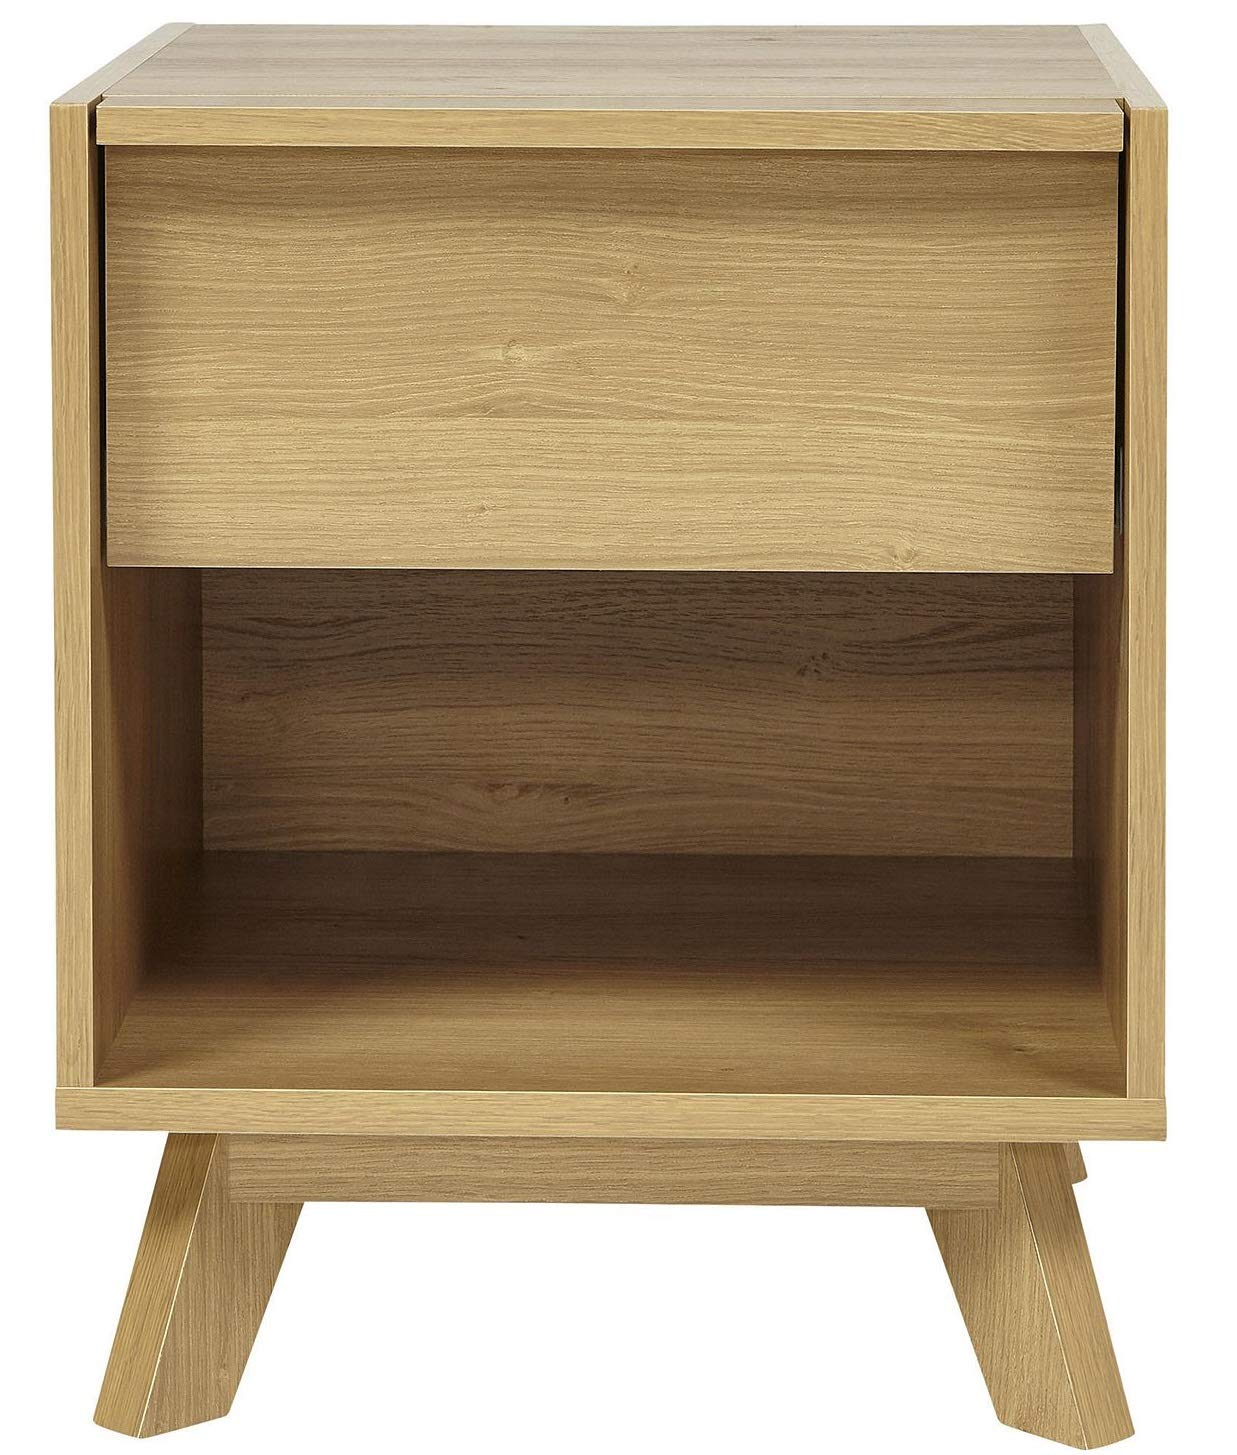 Tesco NEW Flores 1 Drawer Bedside Table - Oak-Effect Finish